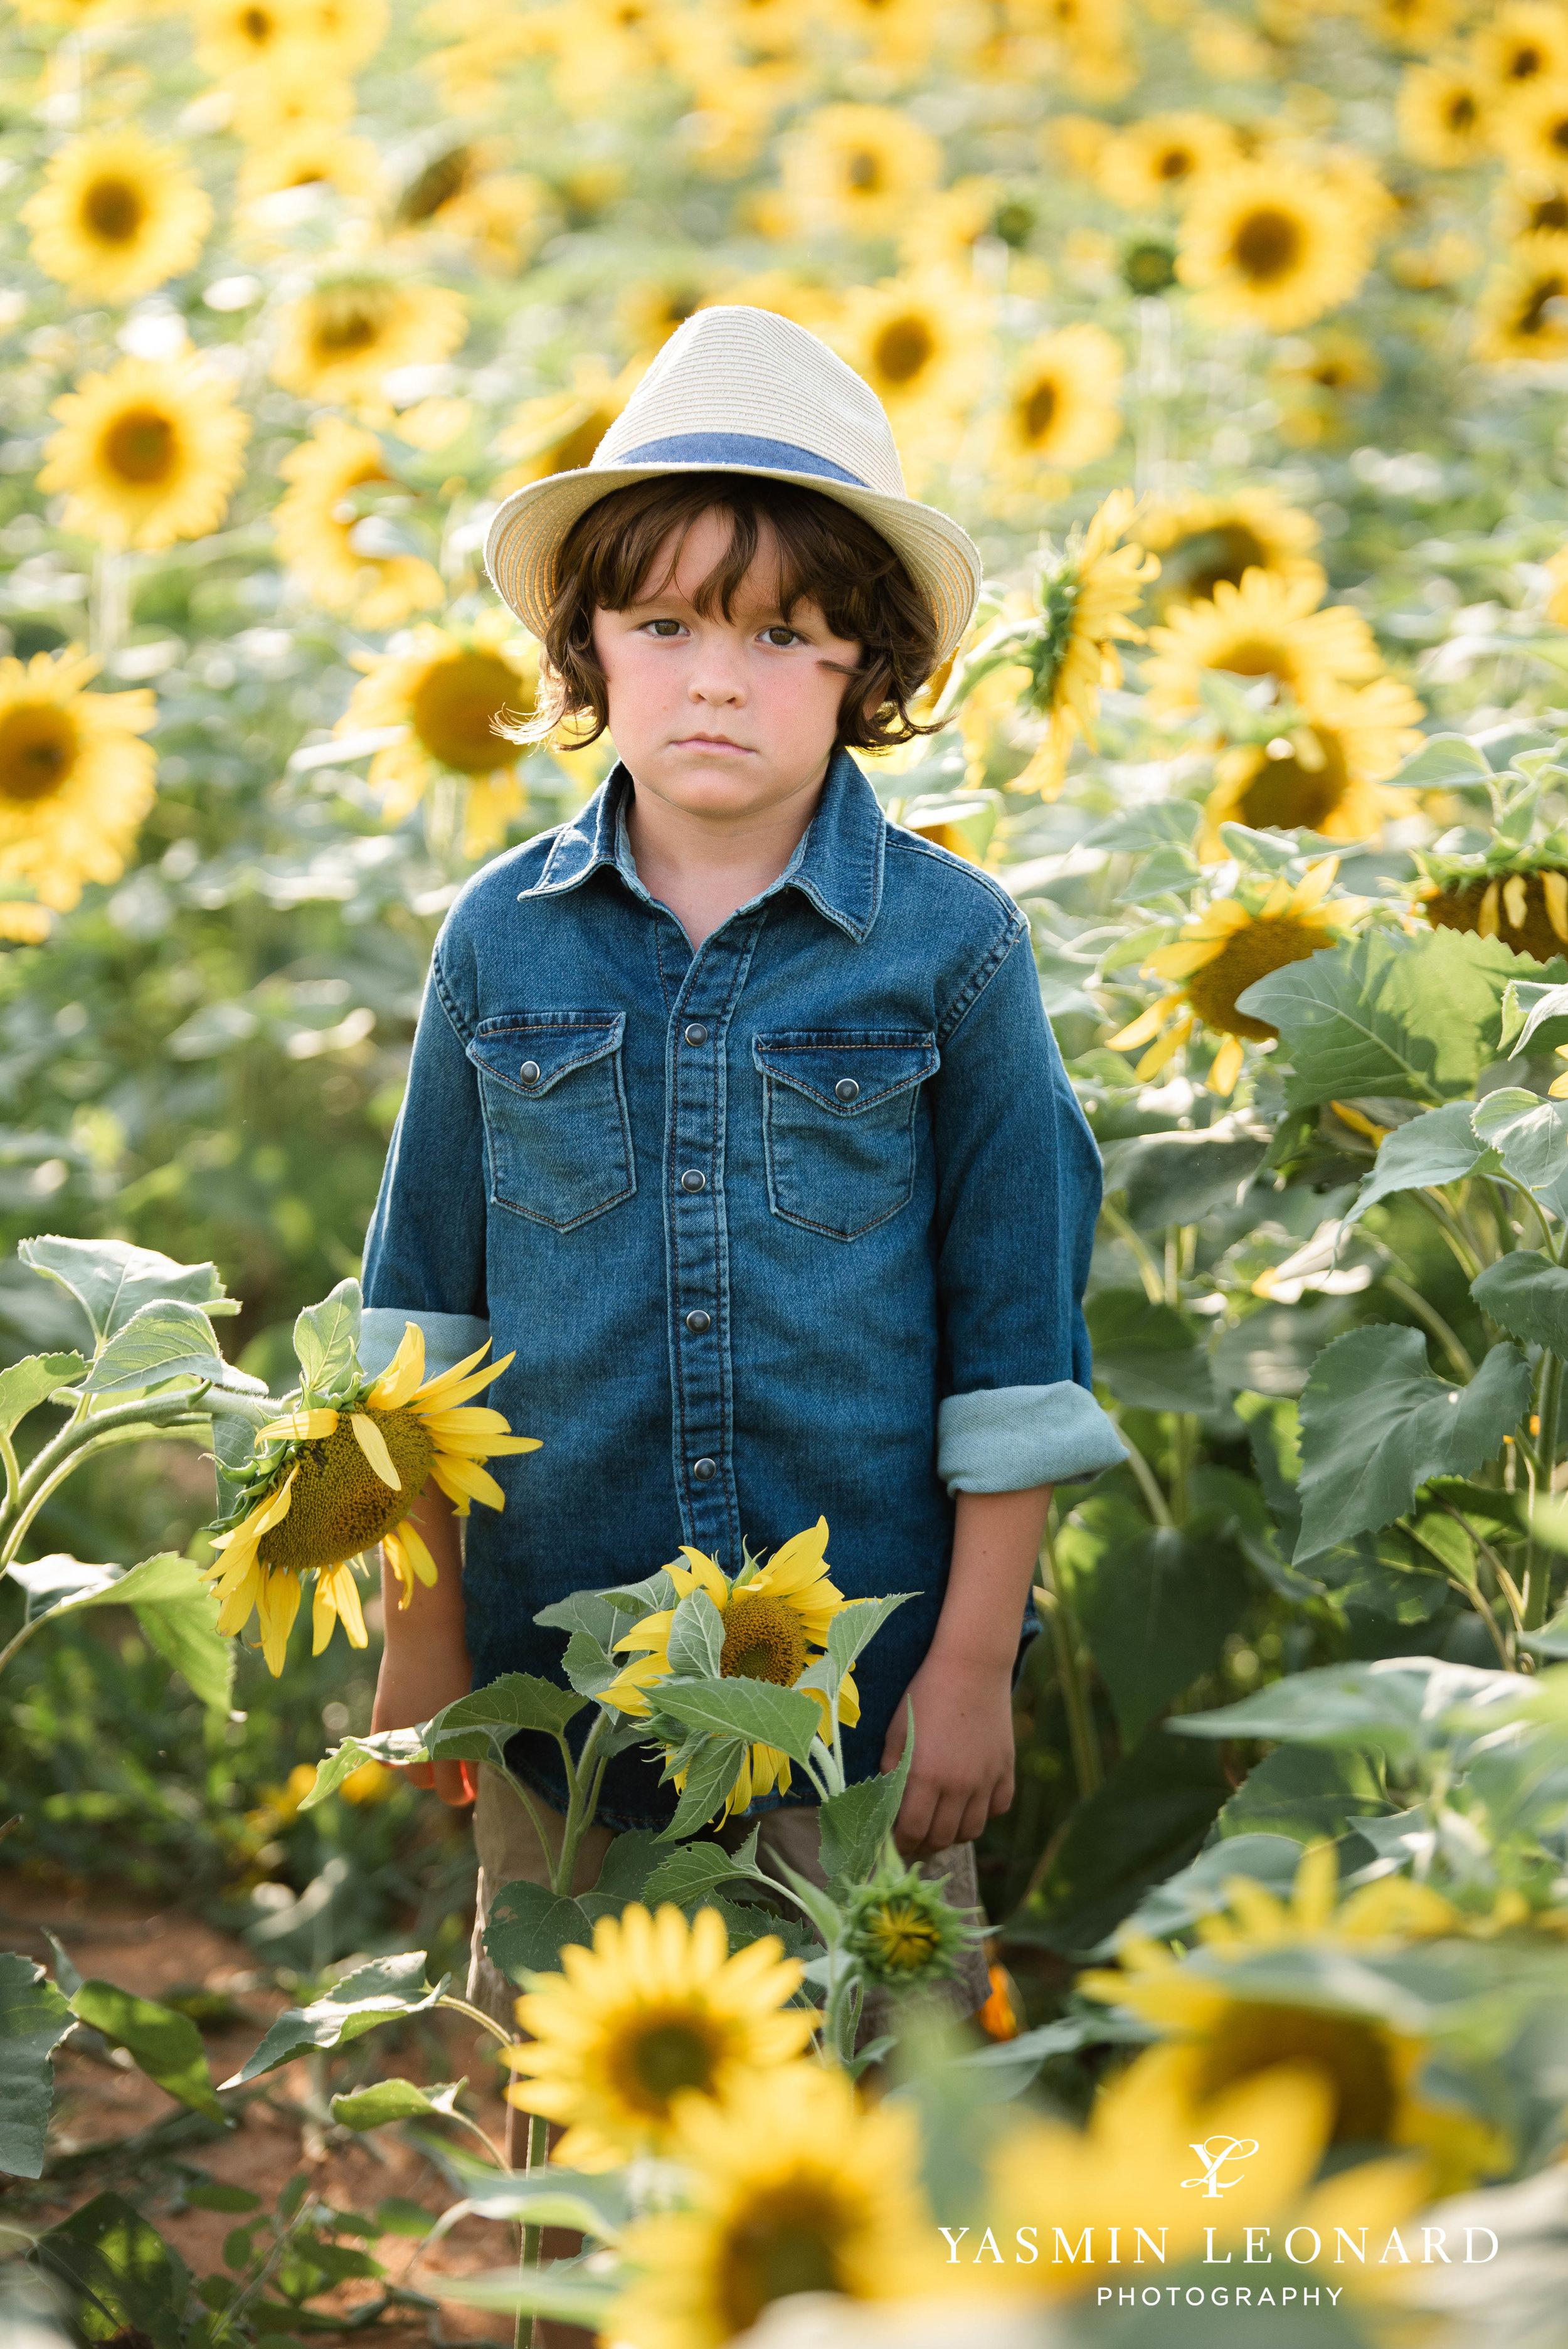 Sunflower Mini Session - Dogwood Farms - Sunflower Field - Boys in Sunflower Field - What to wear sunflower field - Yasmin Leonard Photography-1.jpg